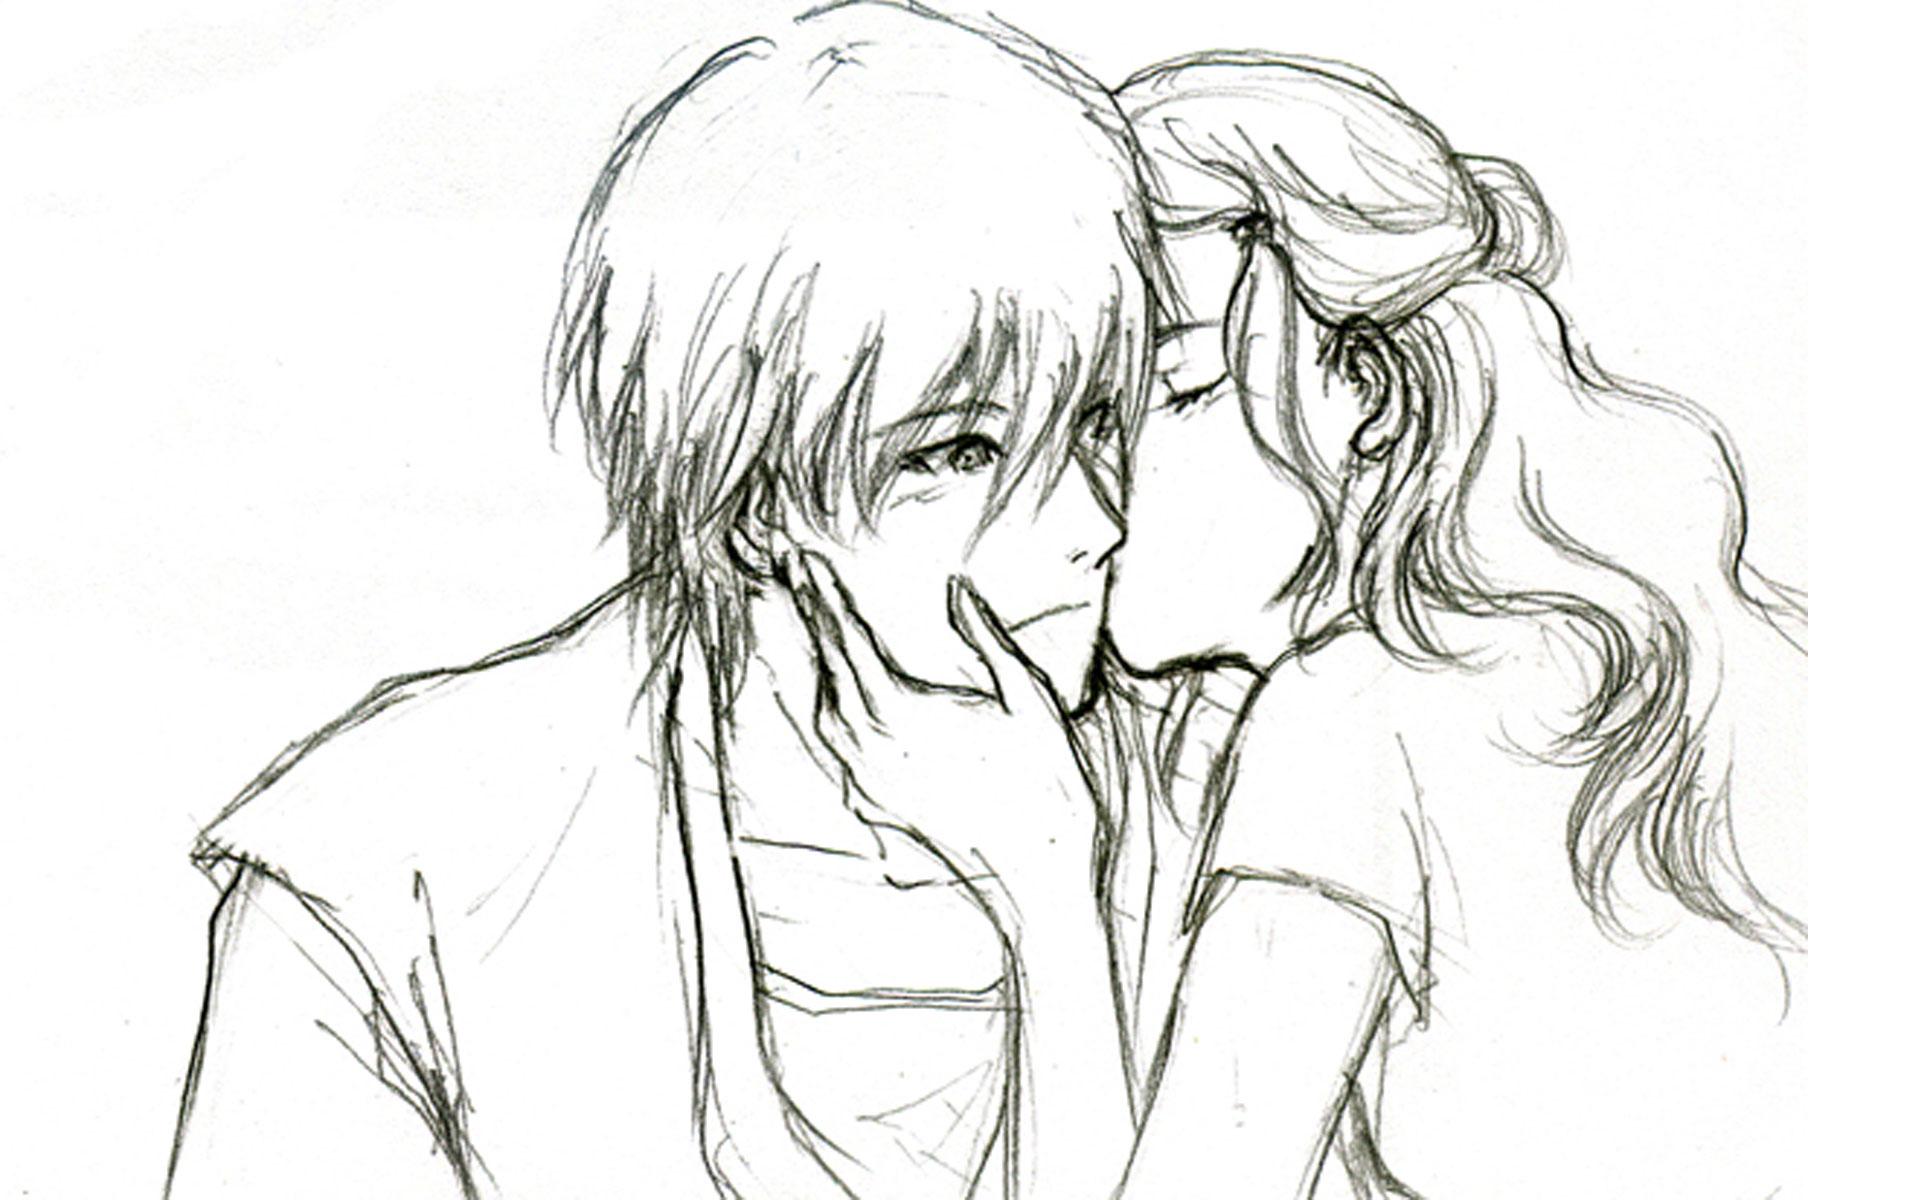 1920x1200 Pencil Sketch Drawing Of Boyfriend And Girlfriend